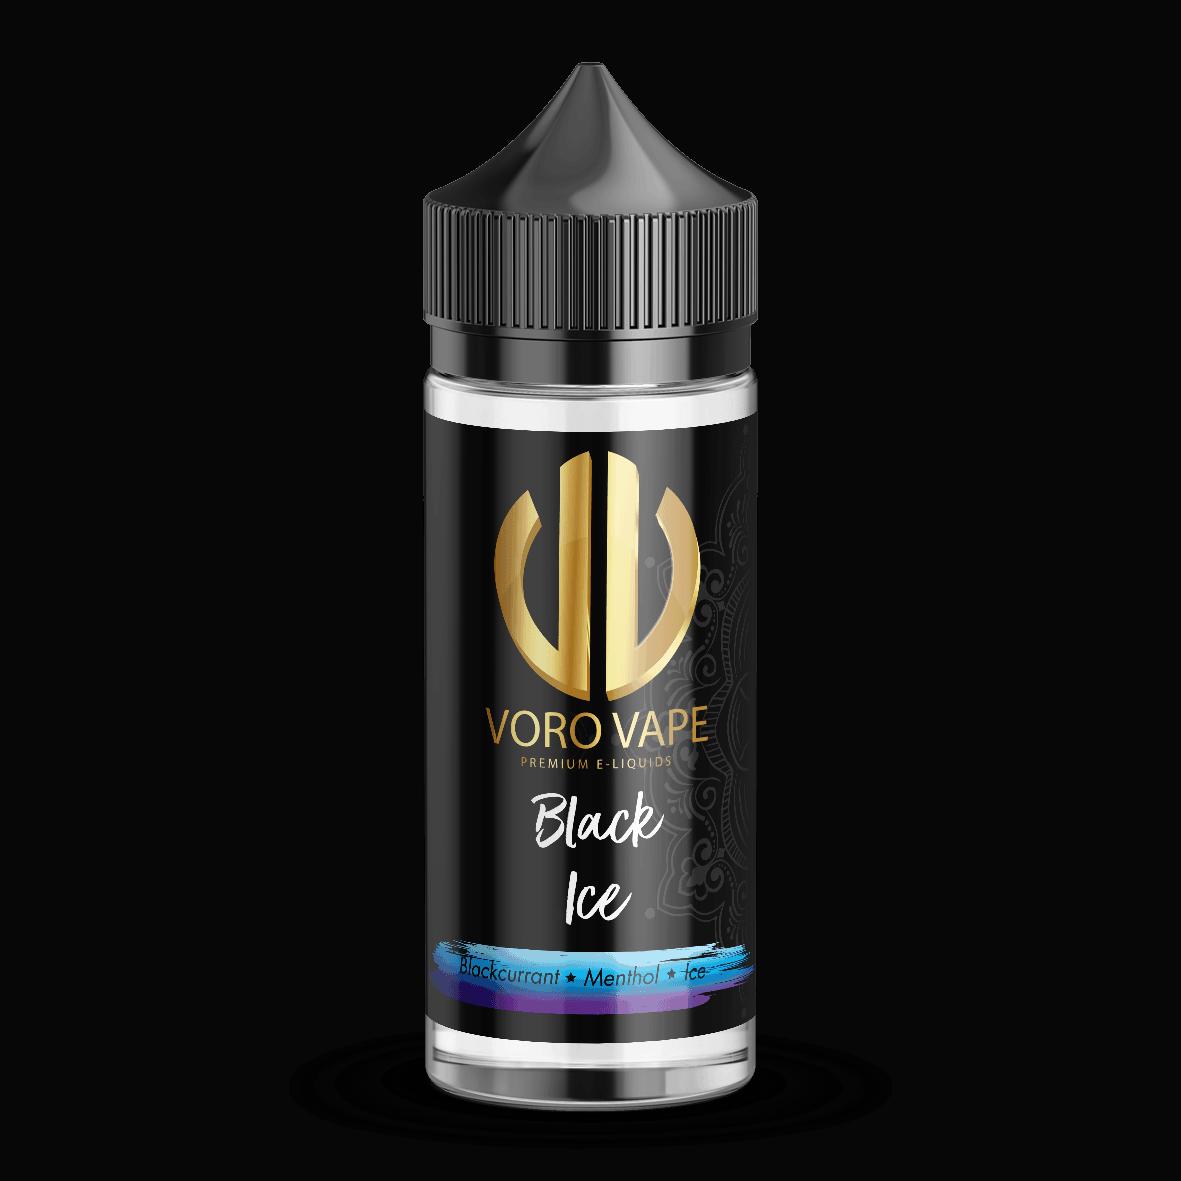 black ice e-liquid by voro vape